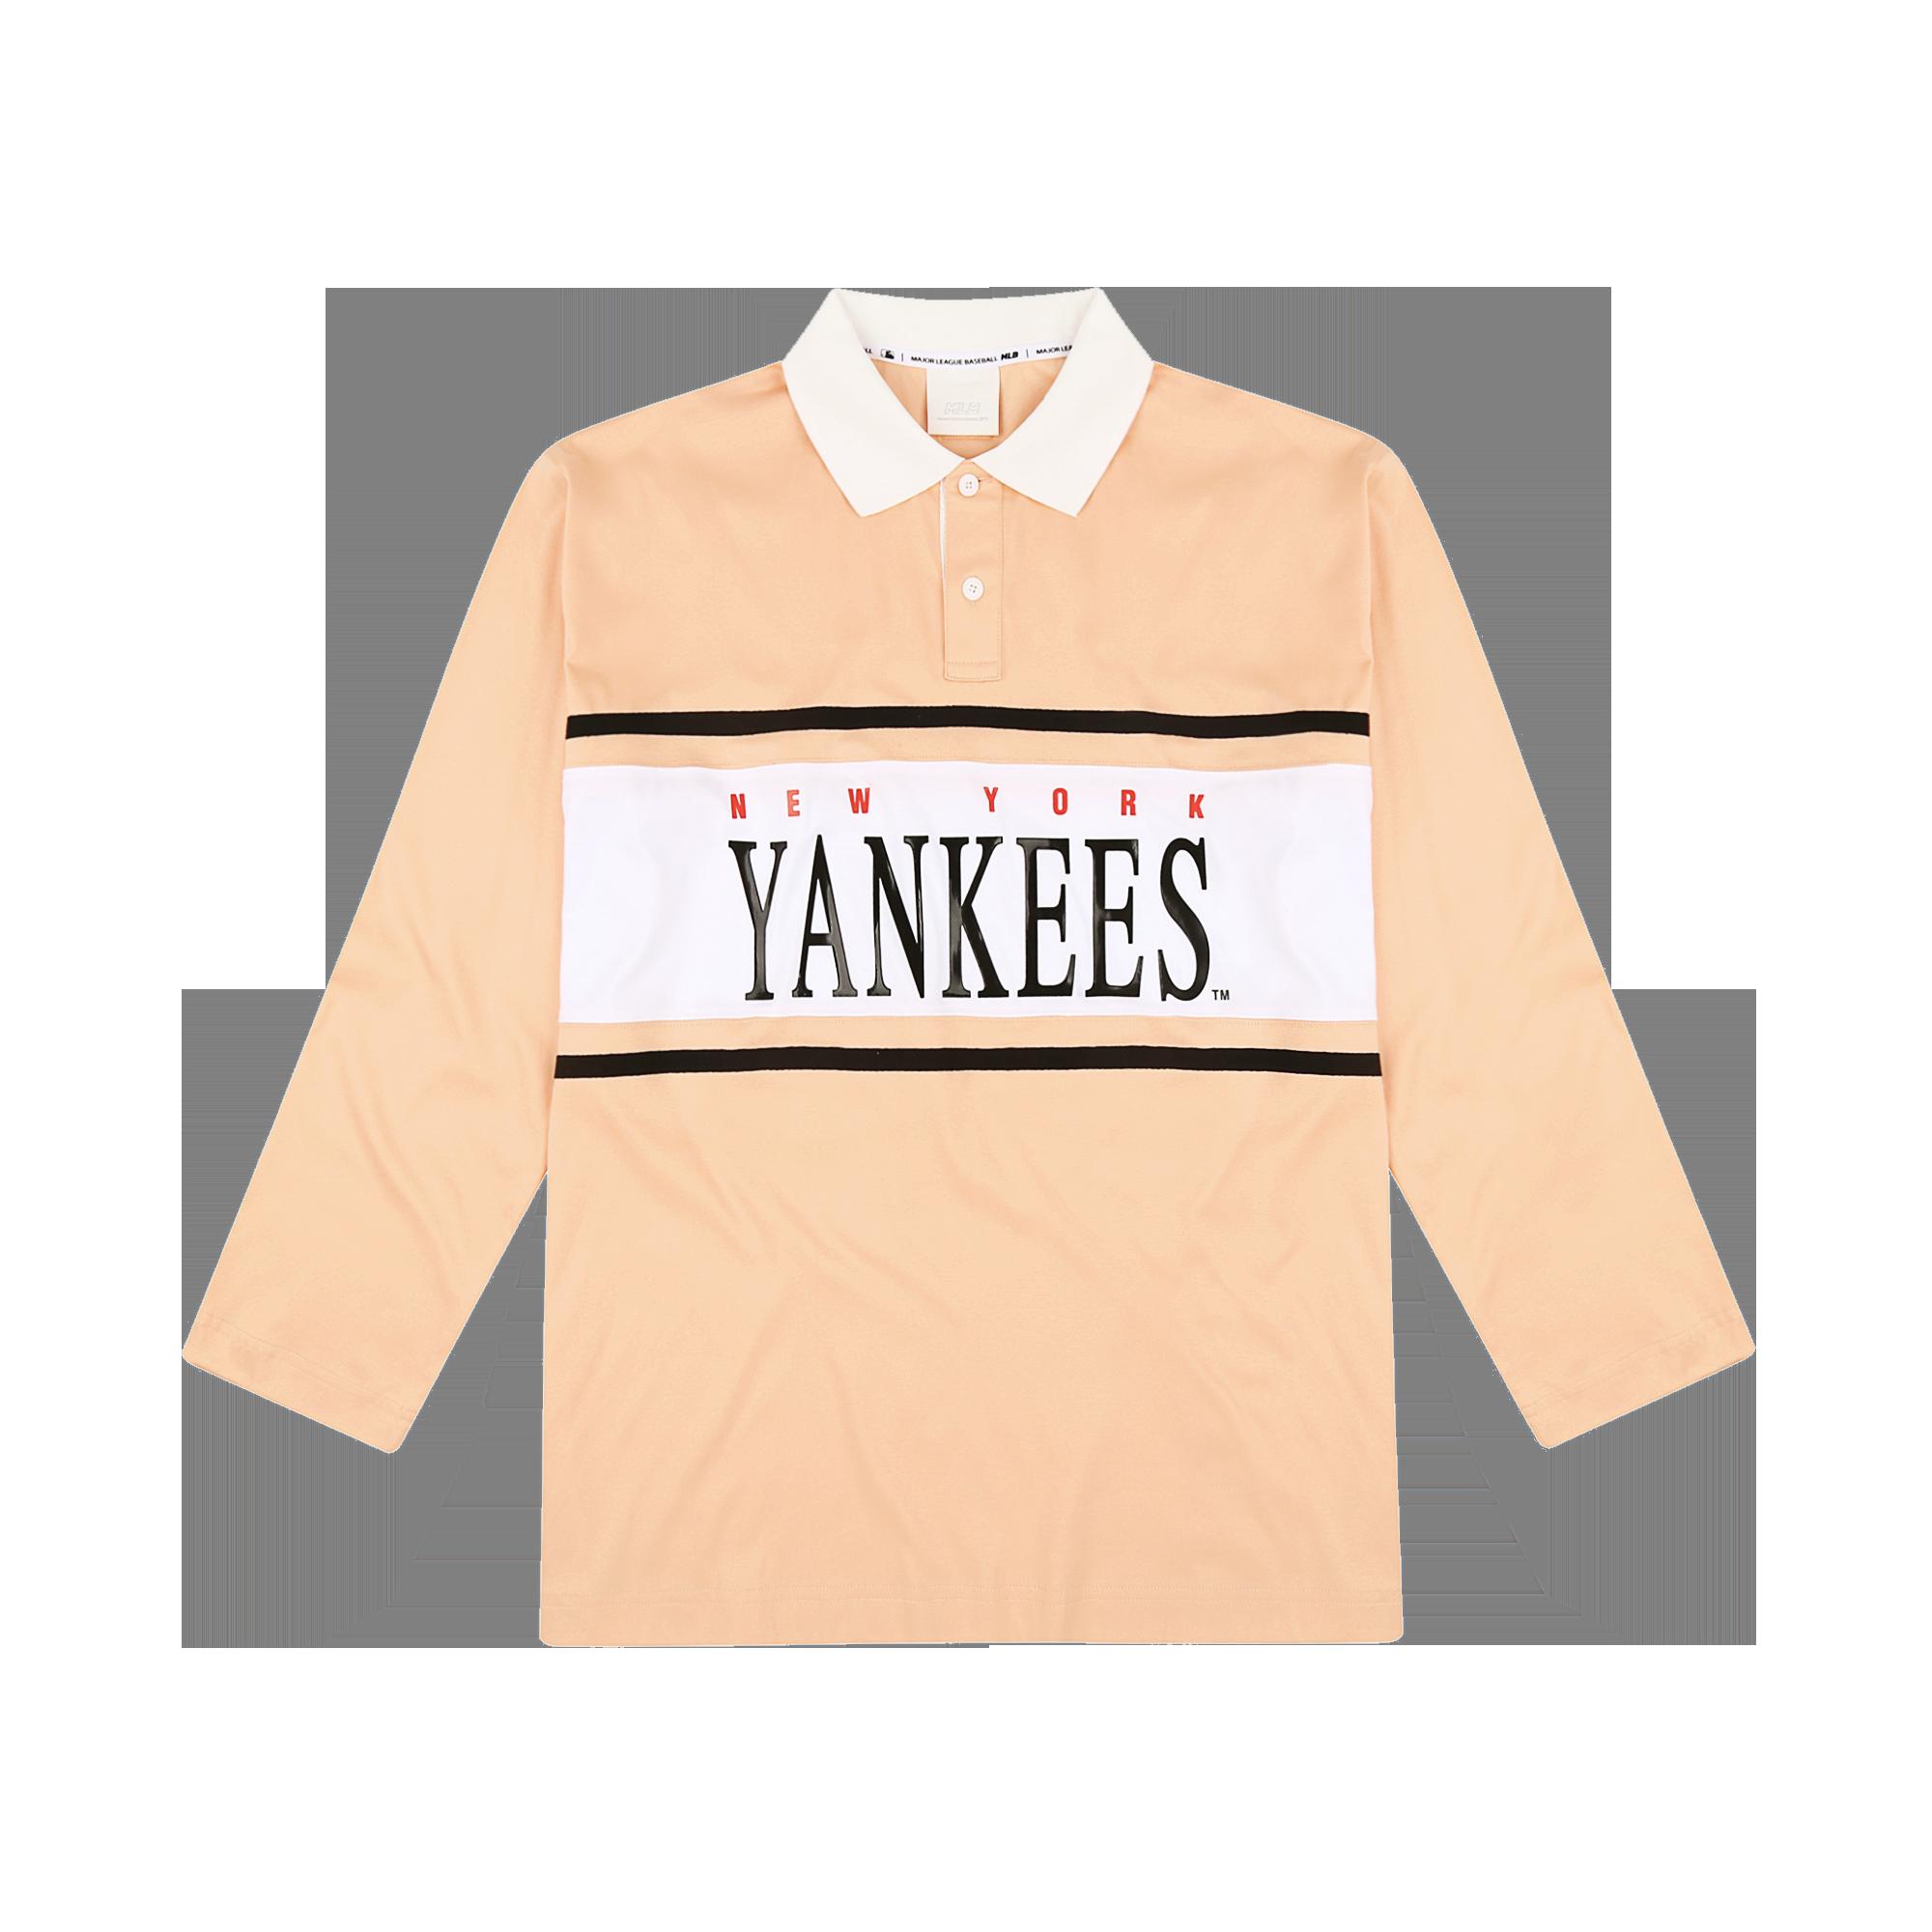 NEW YORK YANKEES RETRO RUGBY T-SHIRT